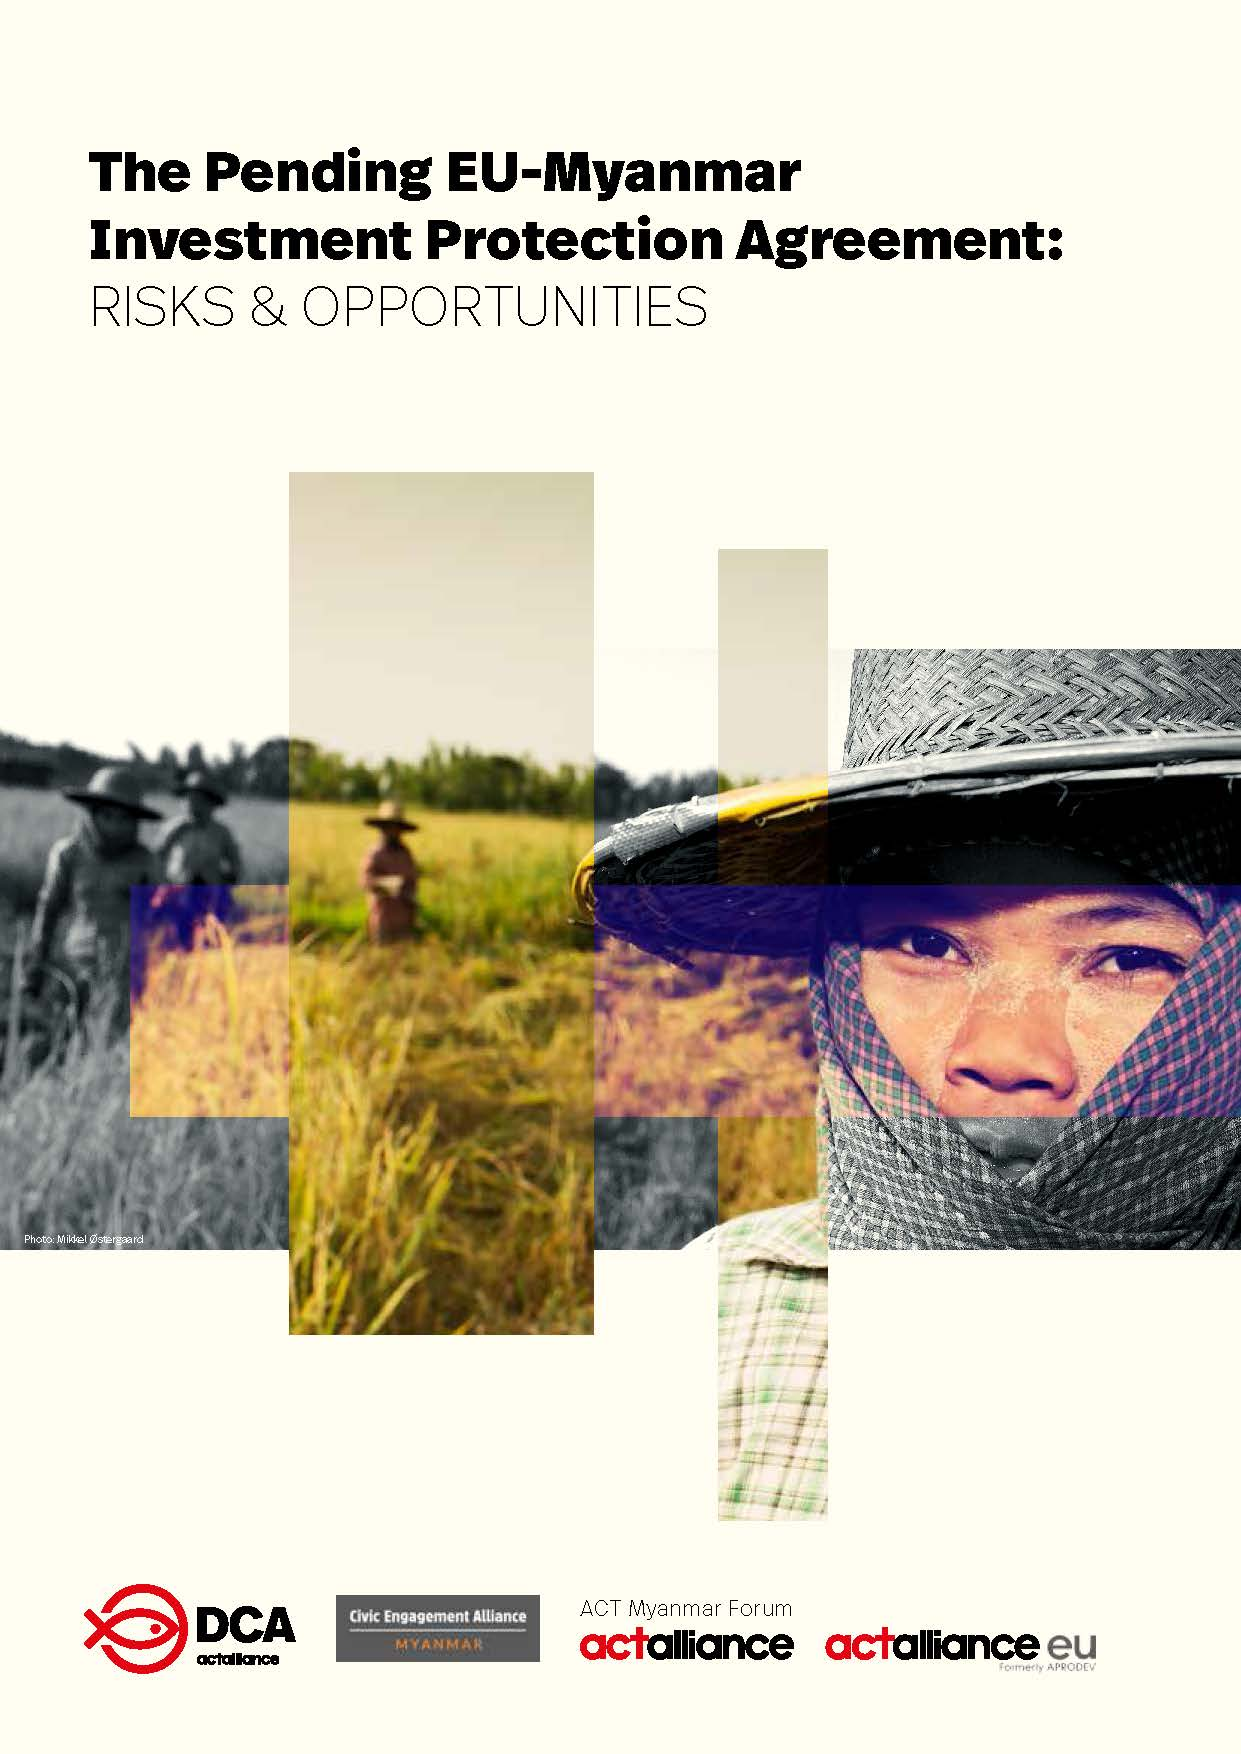 EU Myanmar IPA - Risks and Opportunities image